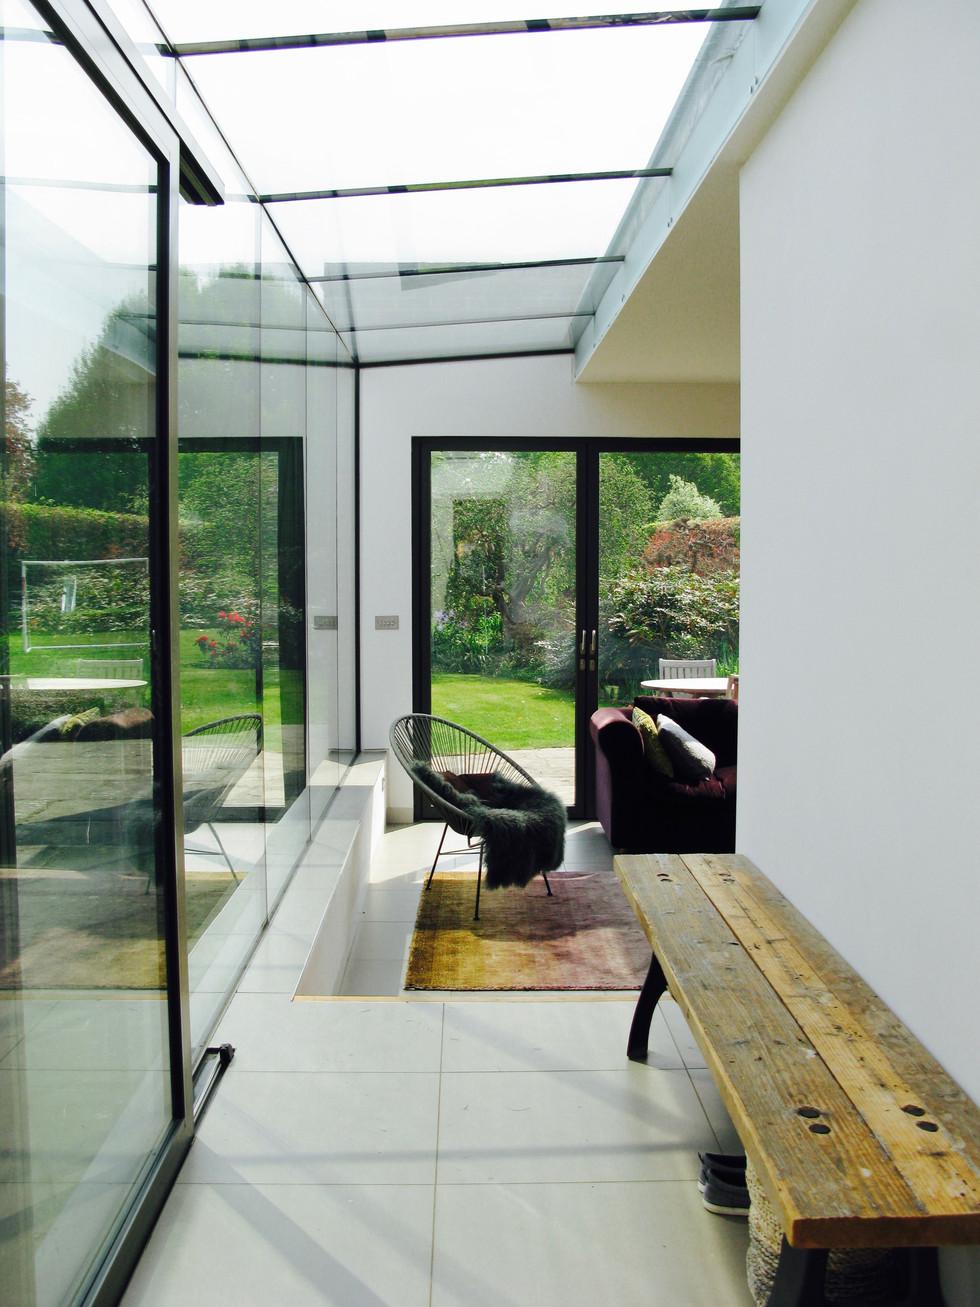 The Oast House   Brasted   © footprintdesignstudio   Architecture   Interior Design   Greenwich   London